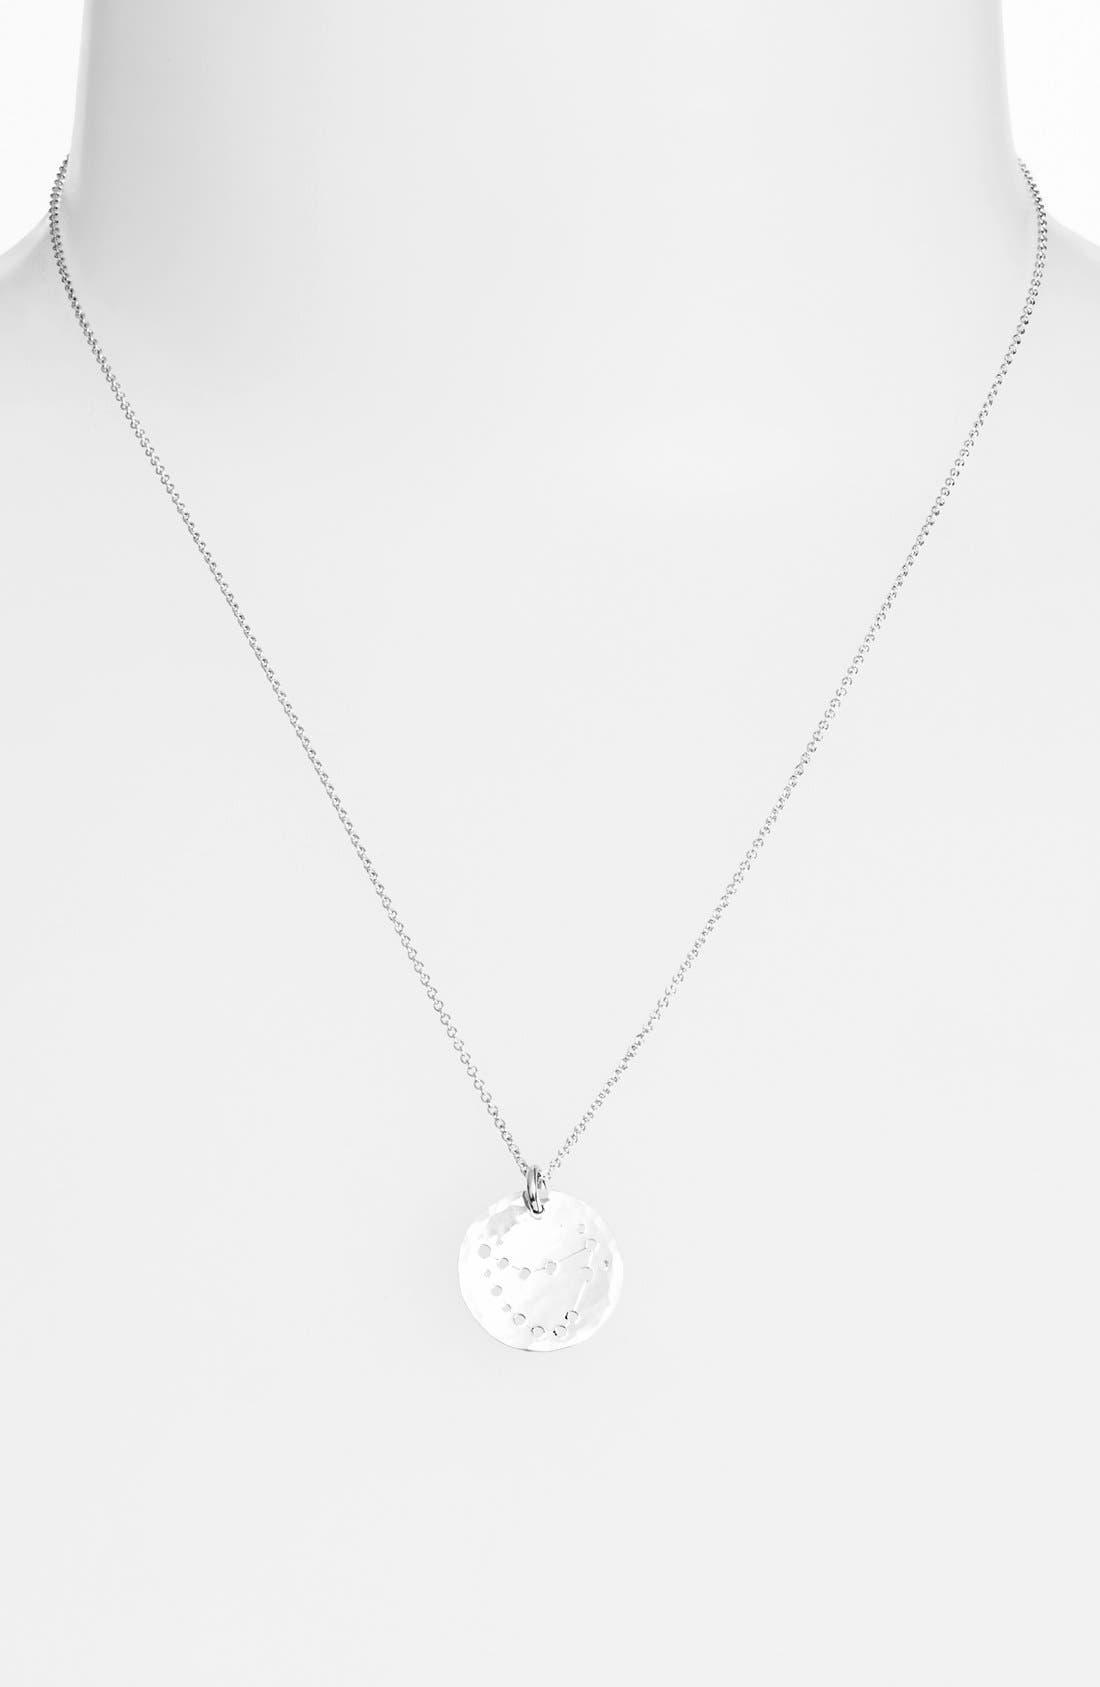 Ija 'Small Zodiac' Sterling Silver Necklace,                             Main thumbnail 10, color,